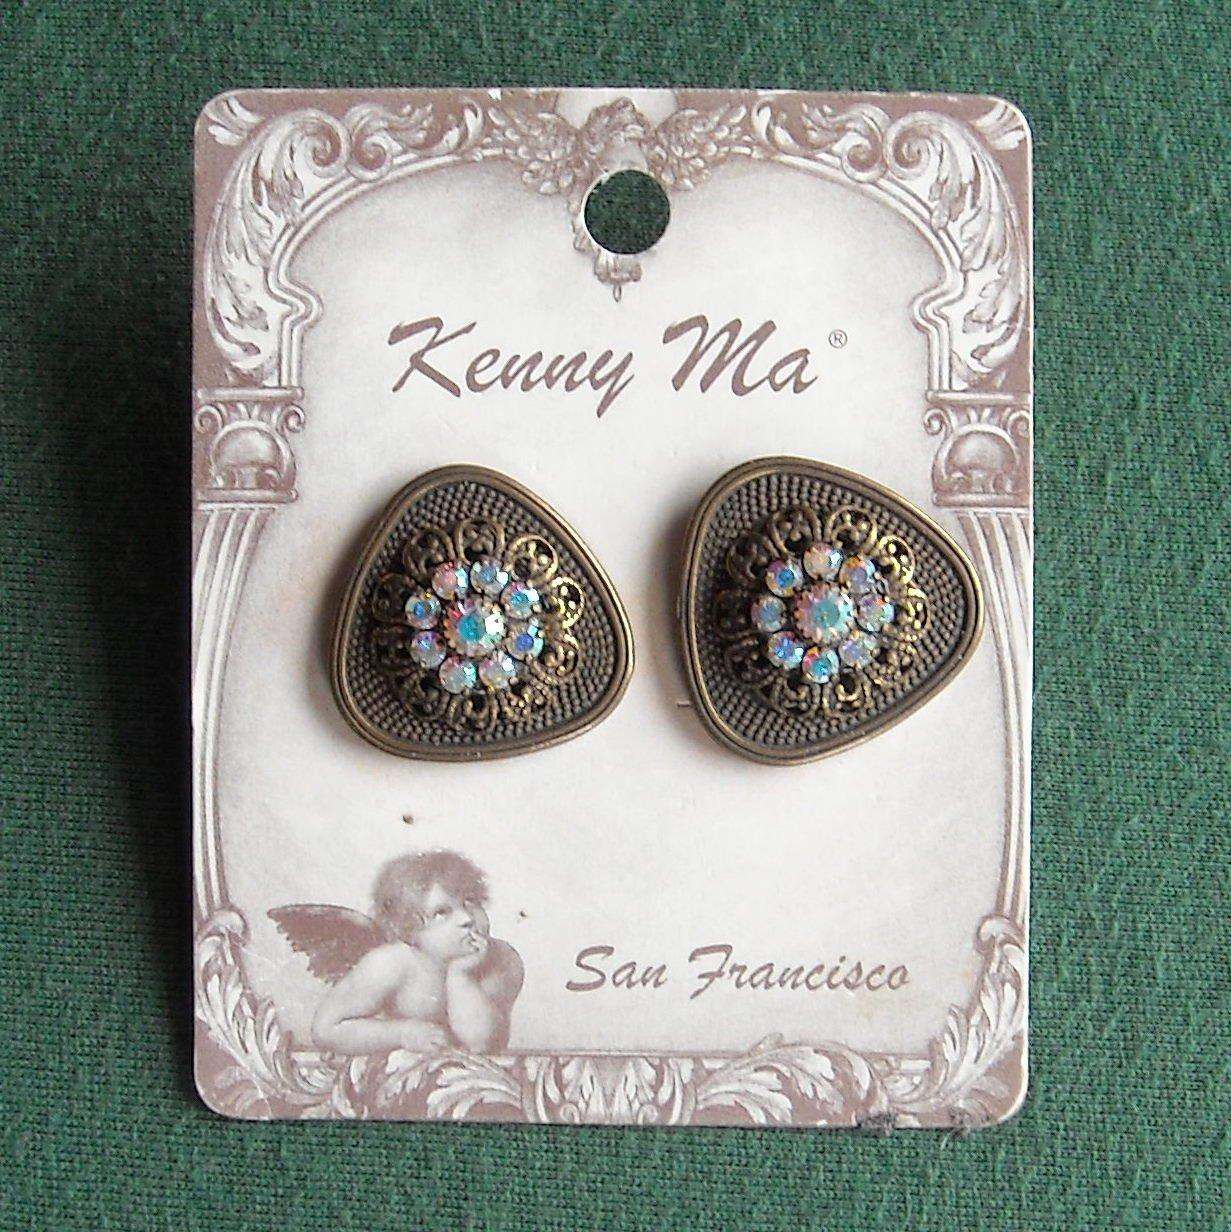 Kenny Ma San Francisco rhinestone pierced earrings